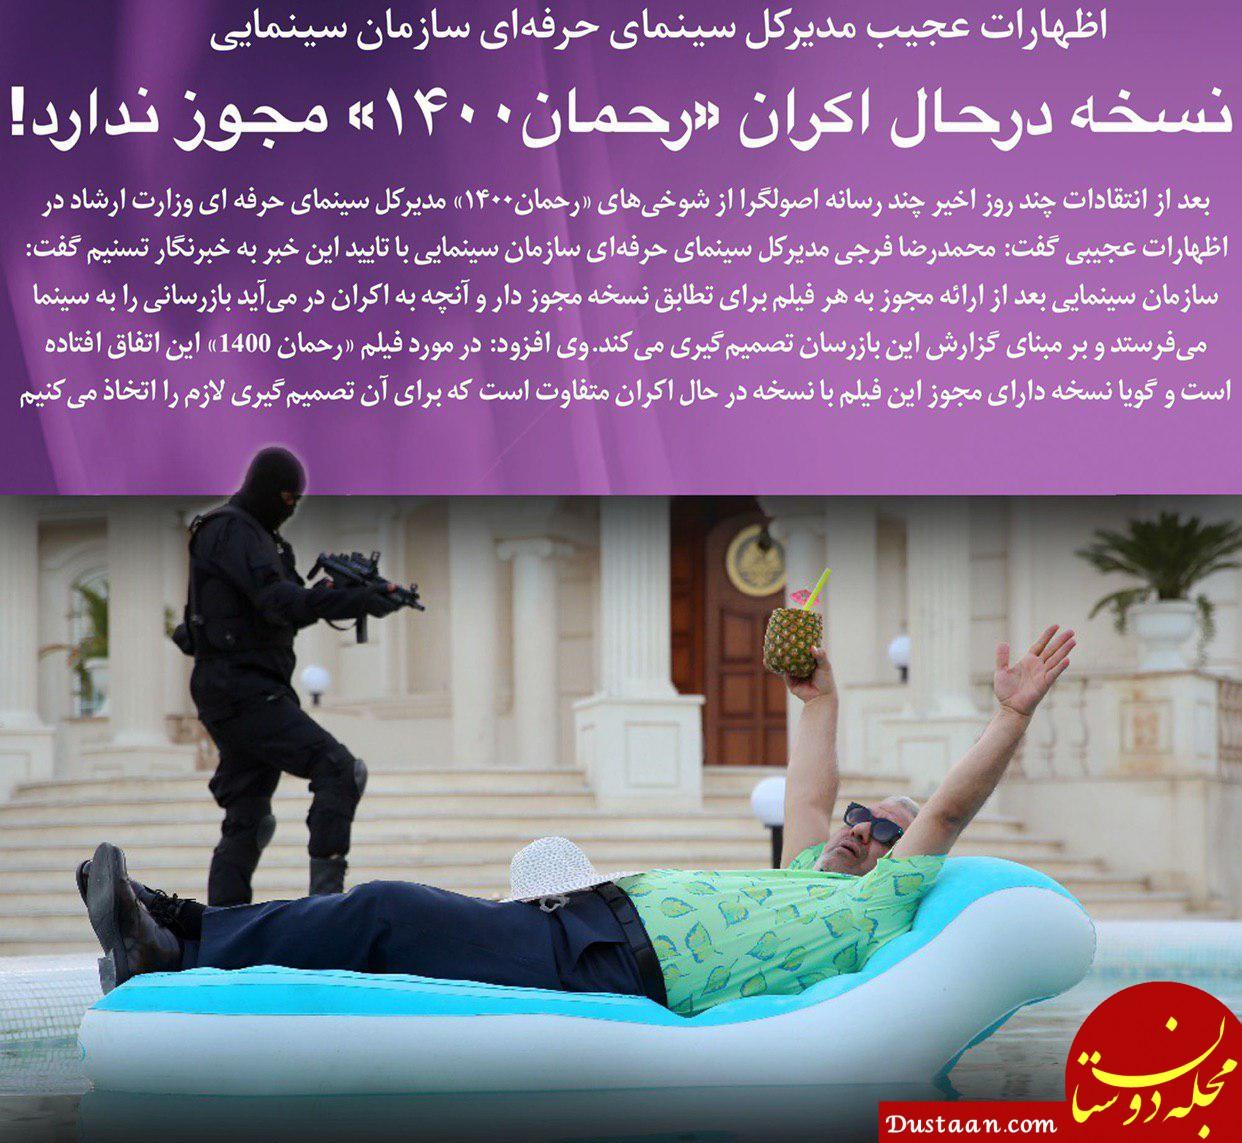 www.dustaan.com نسخه در حال اکران «رحمان ۱۴۰۰» مجوز ندارد!